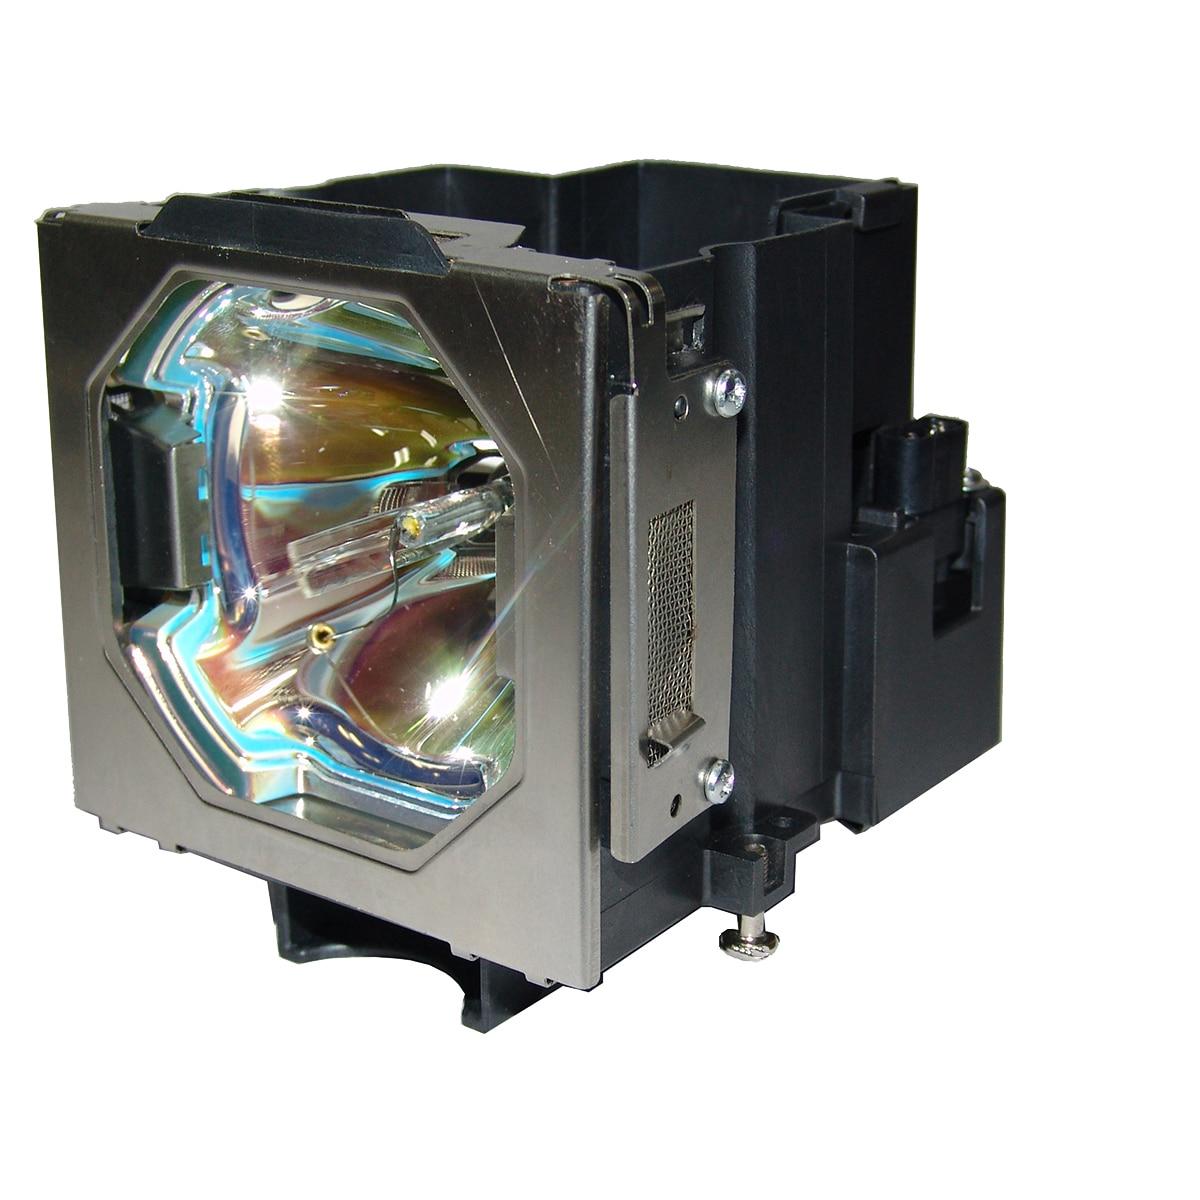 POA-LMP146 POALMP146 LMP146 610-351-5939 for SANYO PLC-HF10000L Projector Bulb Lamp With Housing projector lamp bulb poa lmp125 lmp125 610 342 2626 lamp for sanyo projector plc xtc50 plc xtc50l plc wtc500l bulb with houing